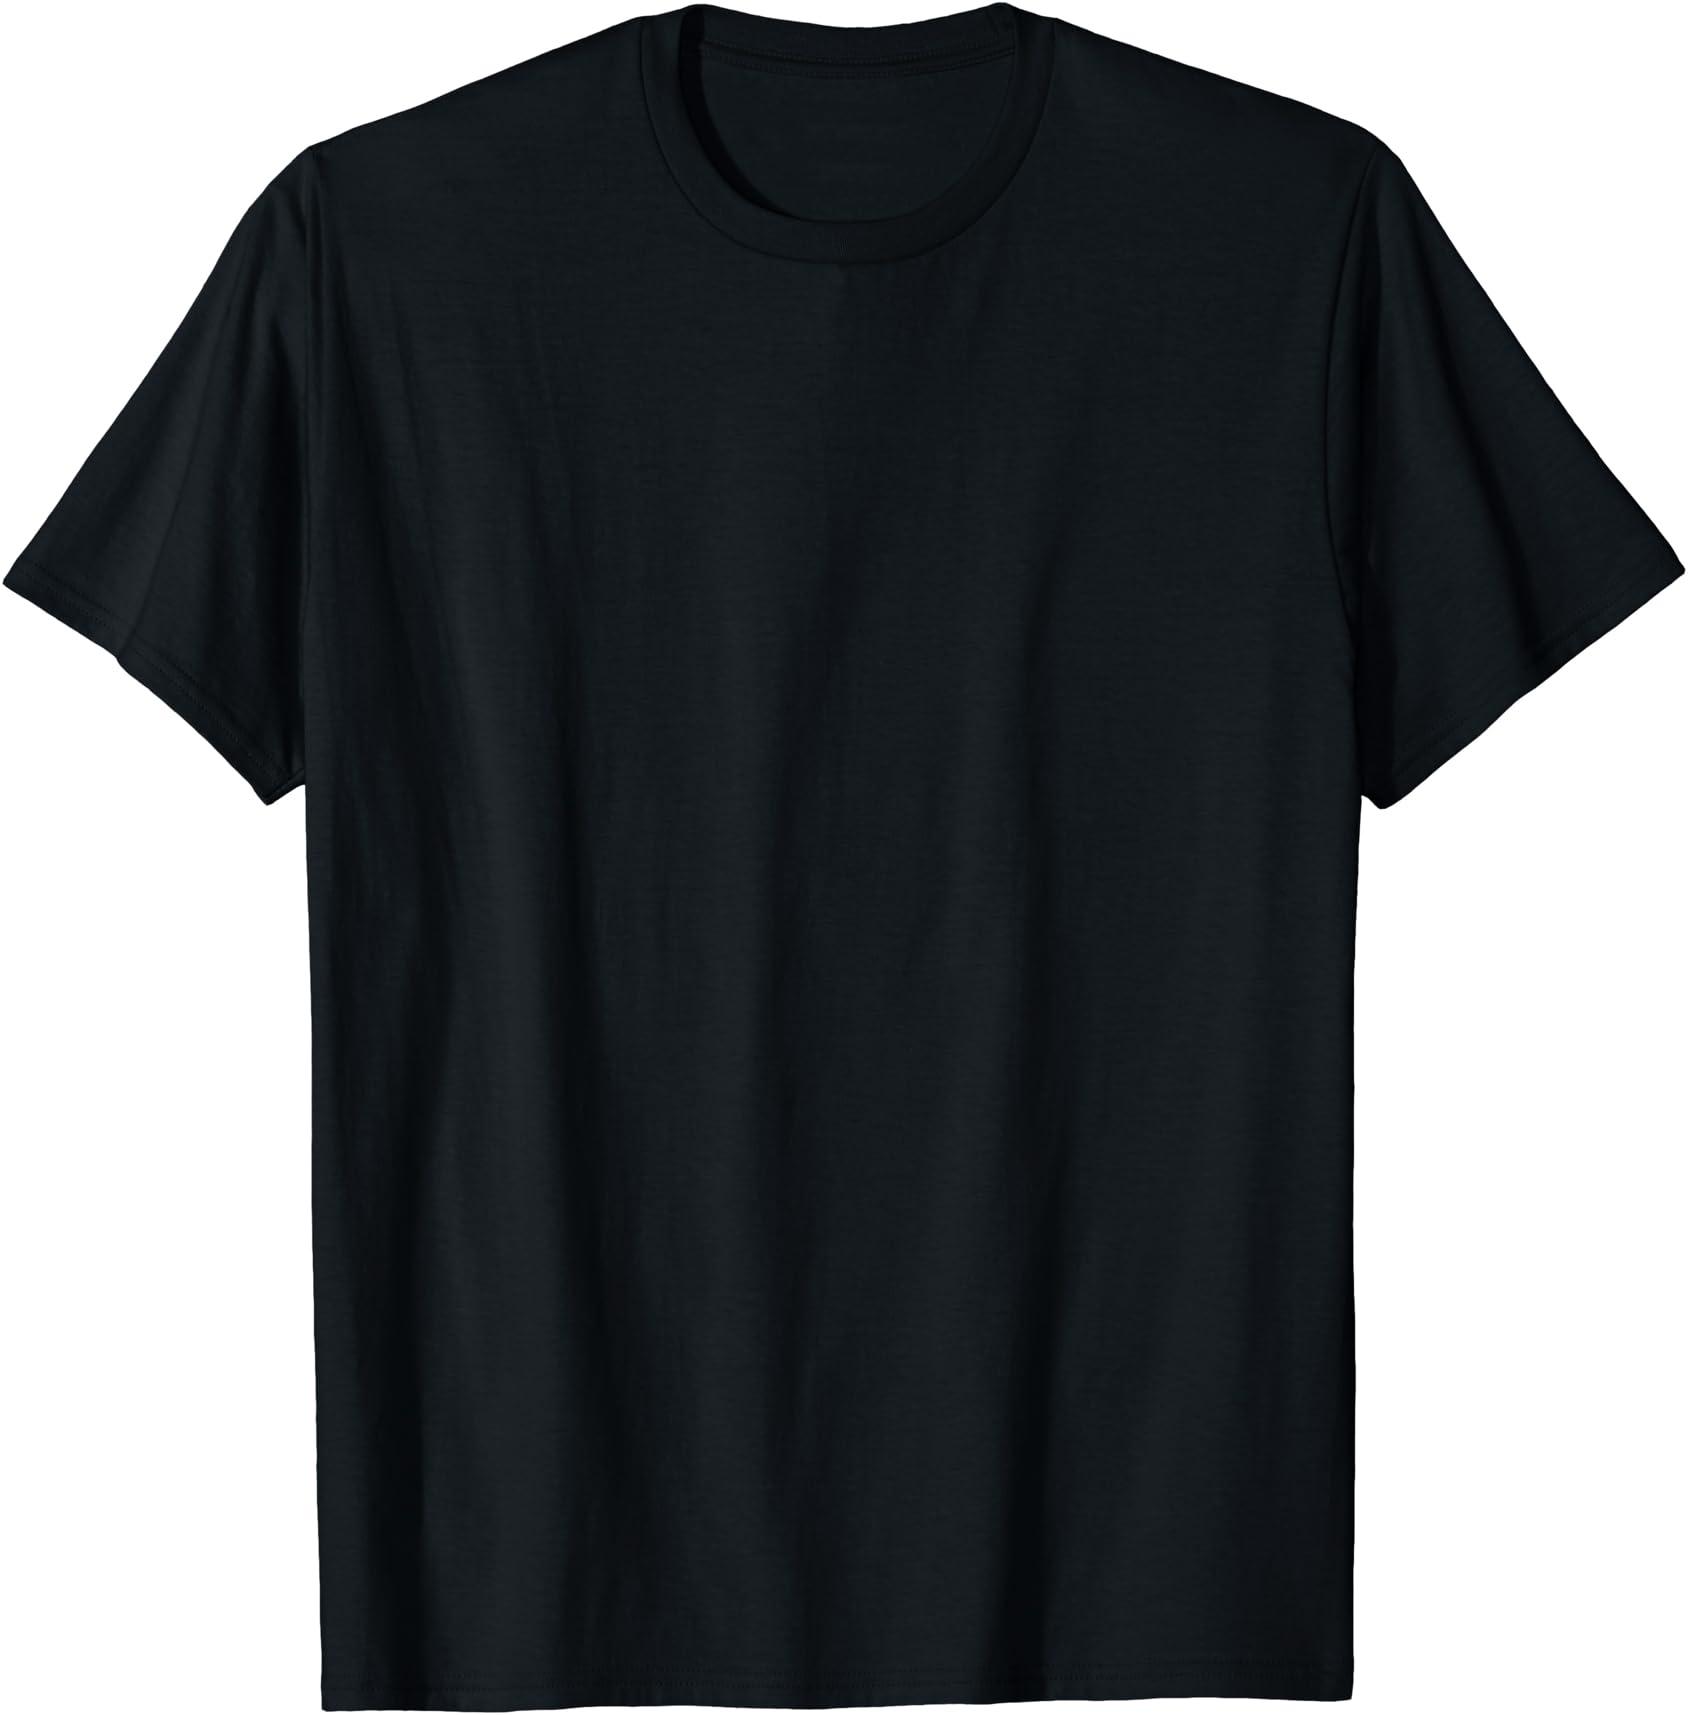 Lifes Too Short T-Shirt Mens Womens Funny USB Geek Nerd Computer Science gift